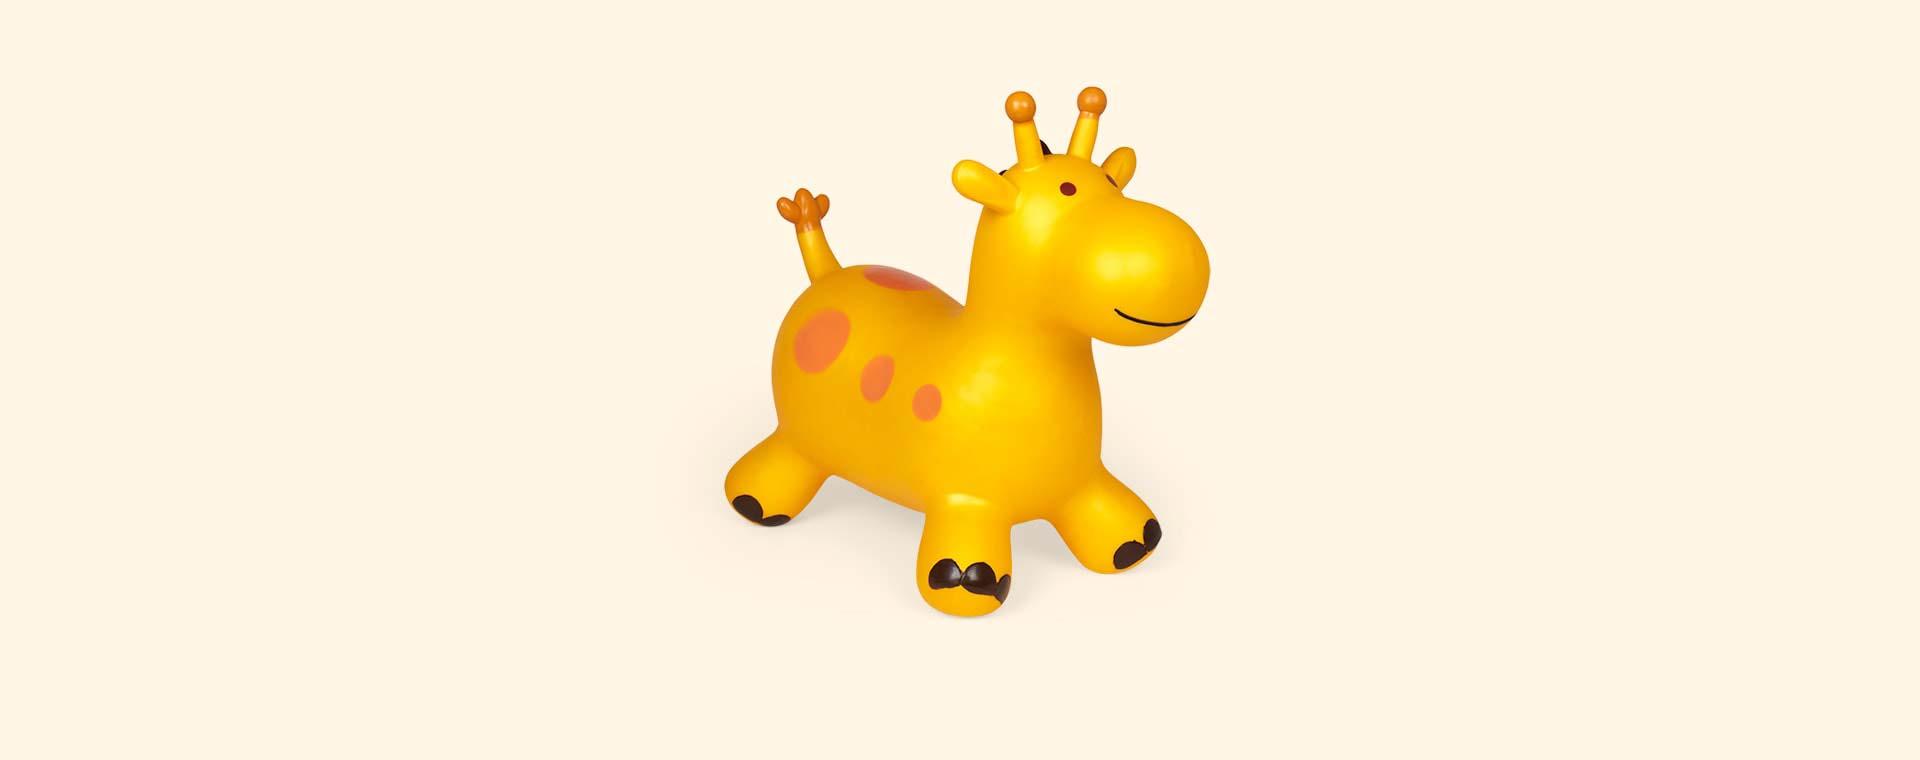 Yellow Giraffe Happy Hopperz Giraffe Hopper